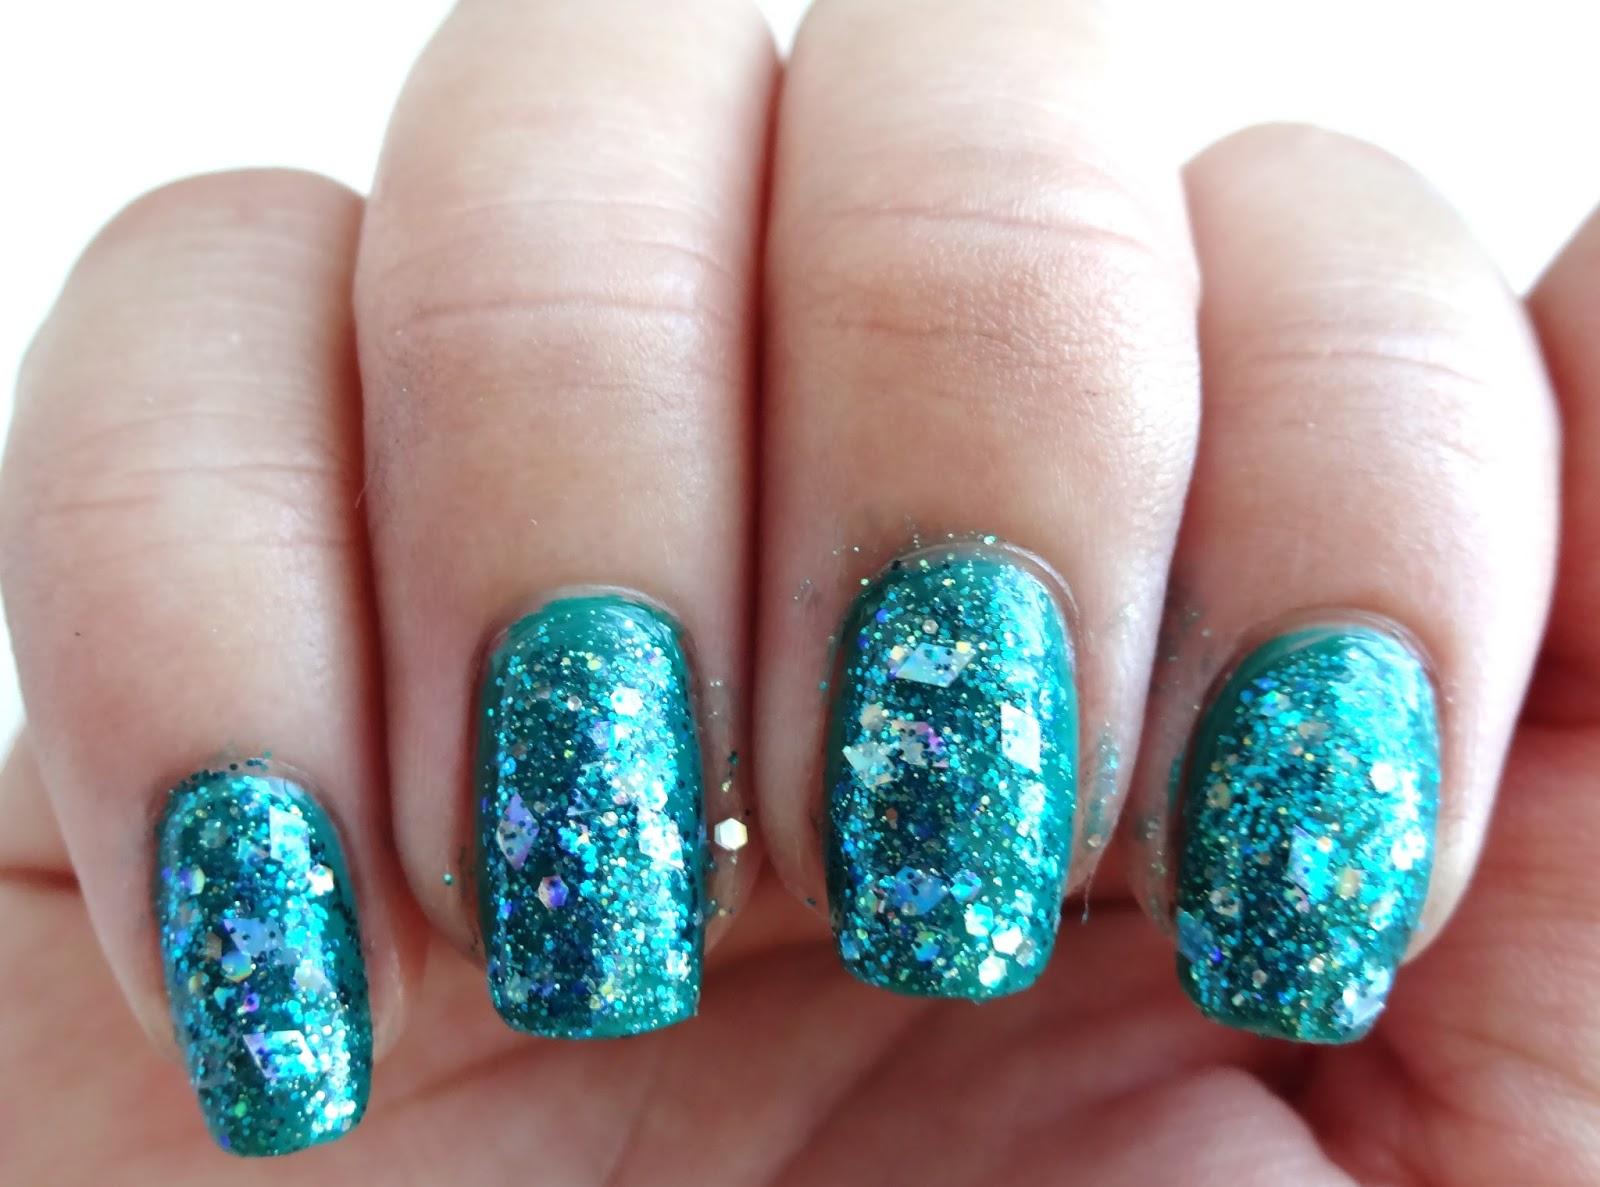 Teal Glitter Nail